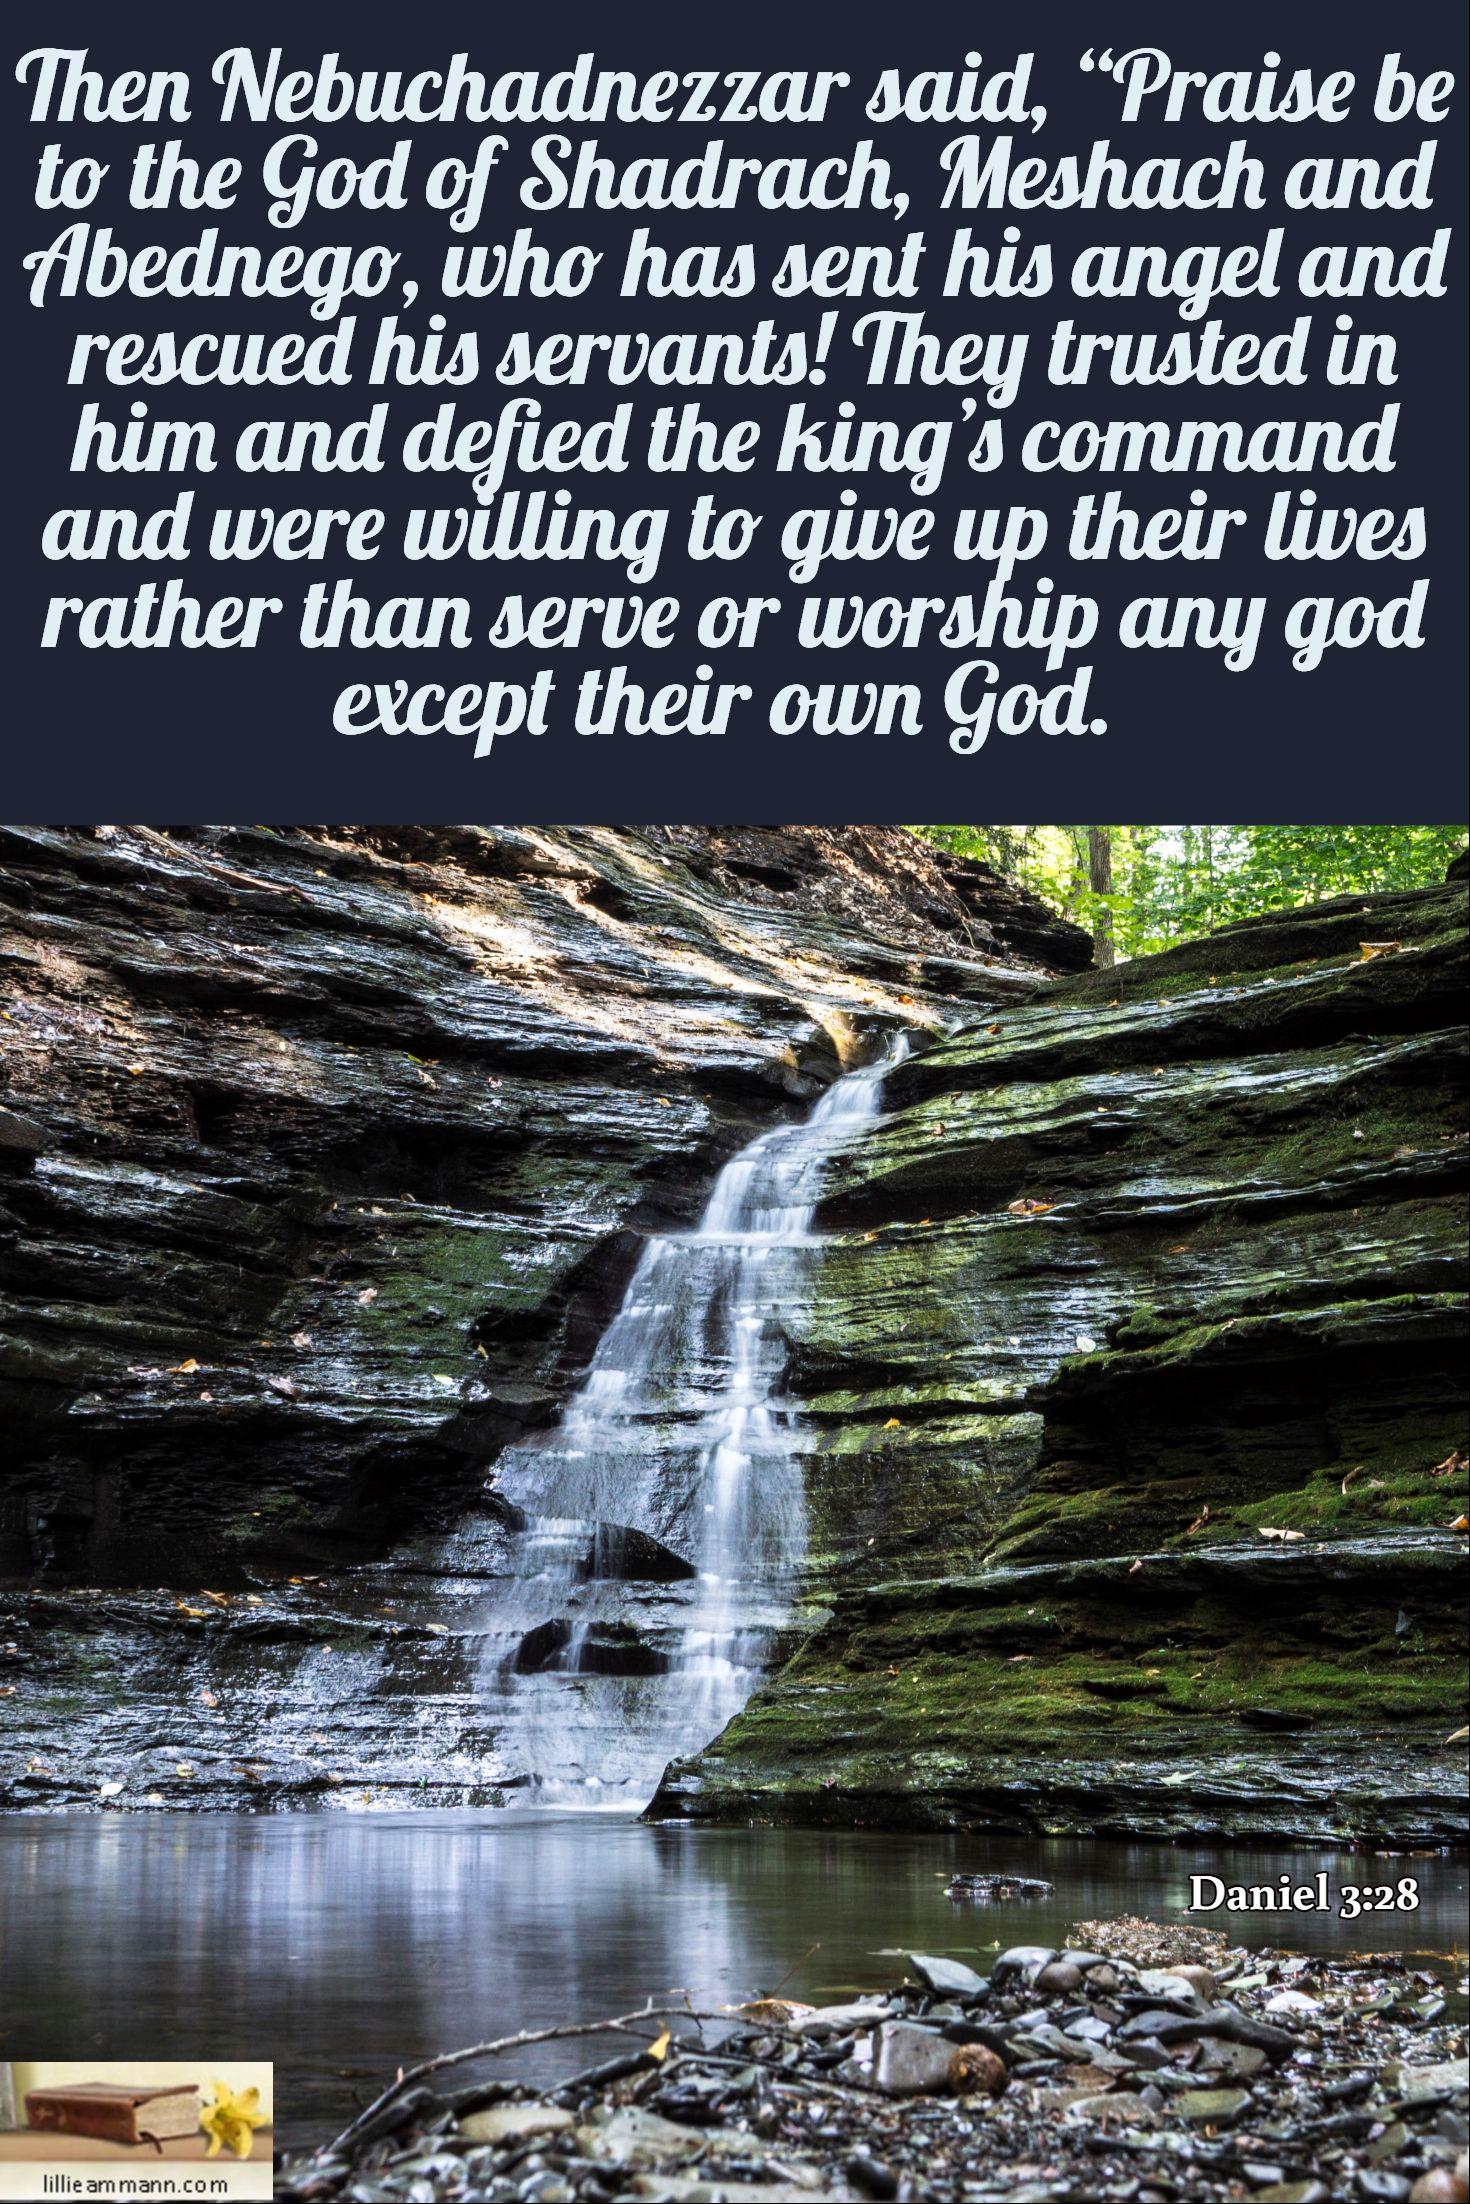 then nebuchadnezzar said u201cpraise be to the god of shadrach